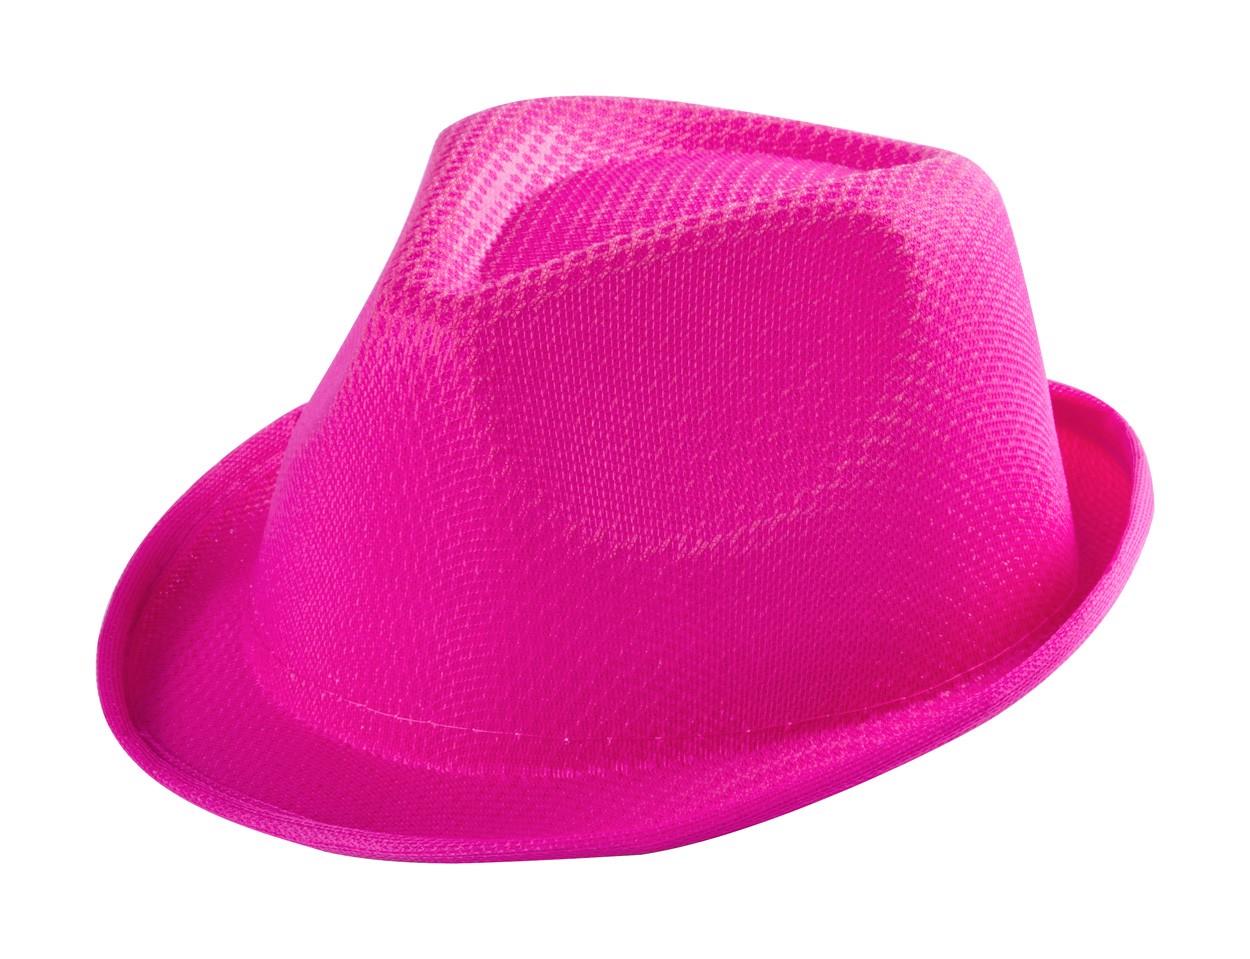 Klobouk Tolvex - Růžová